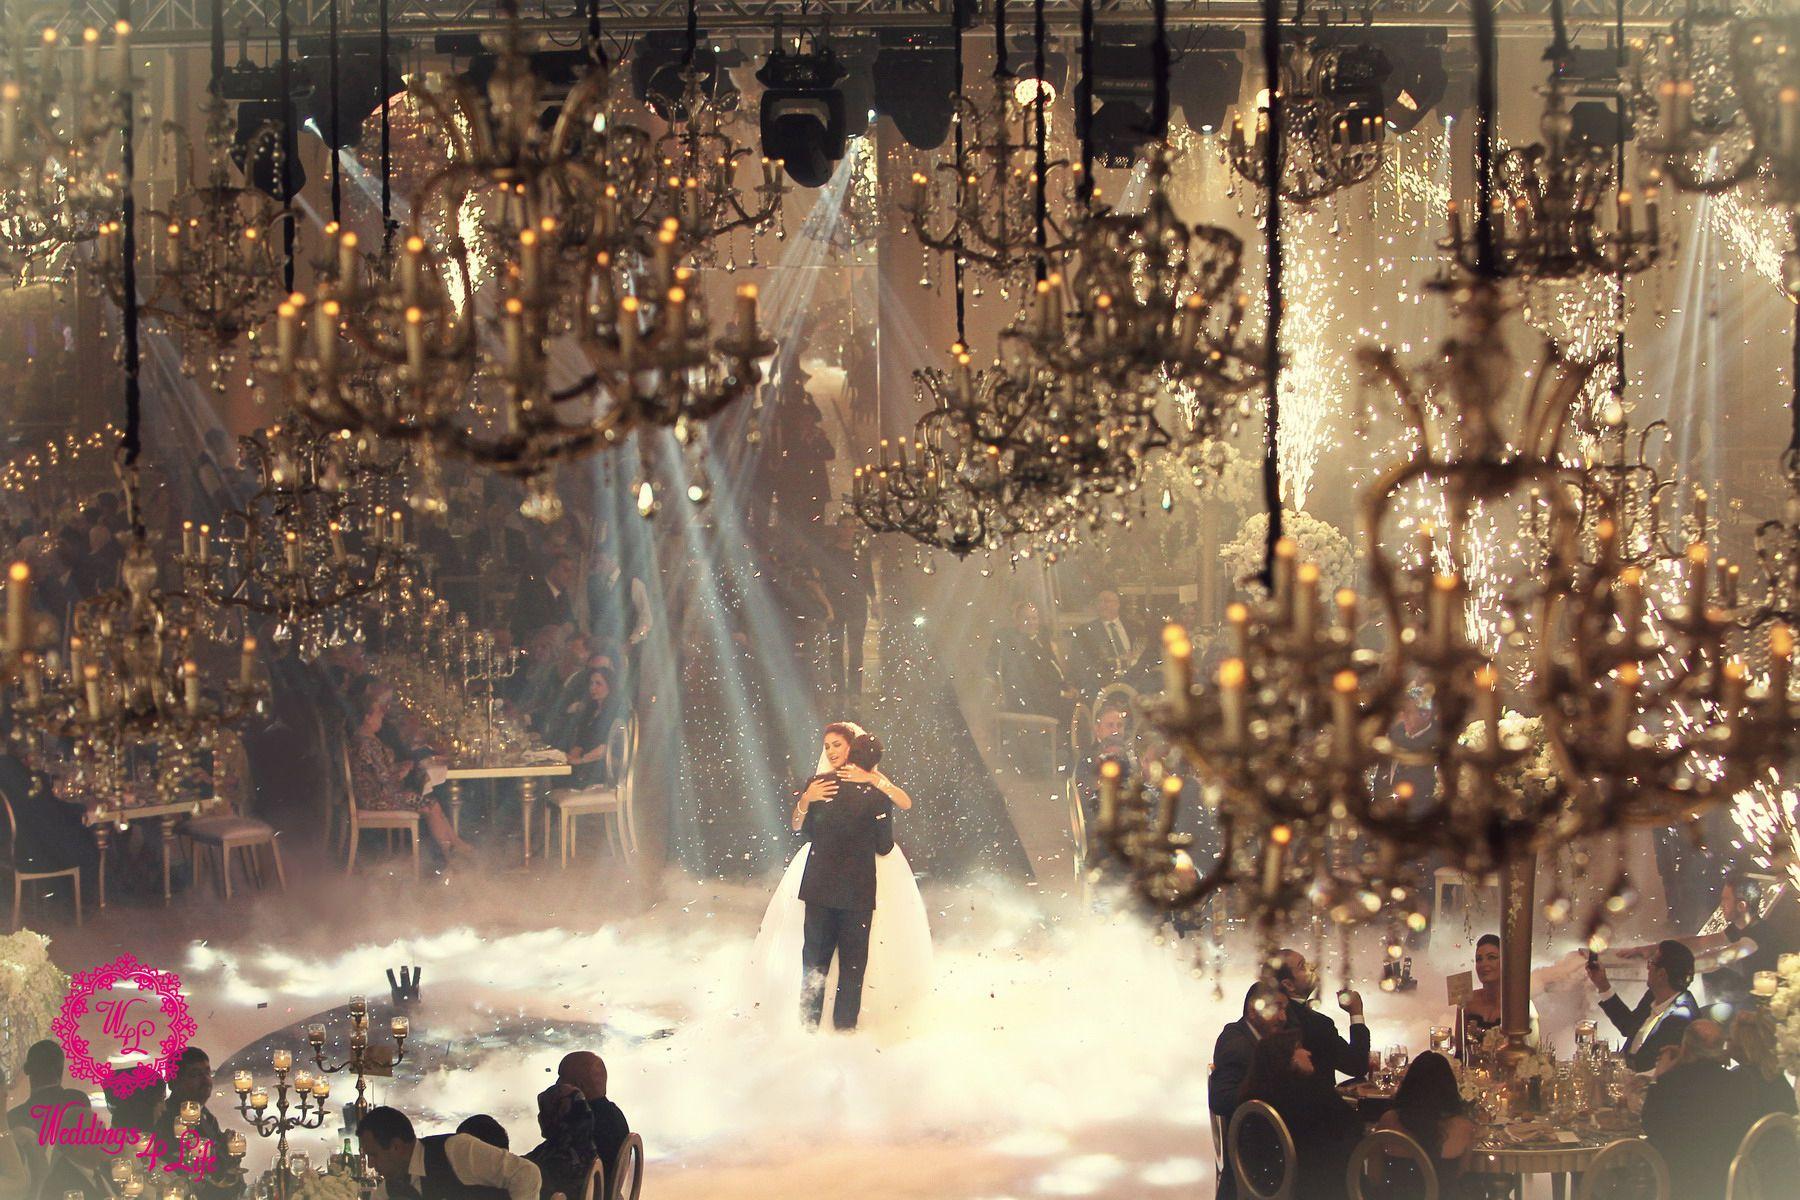 Weddings Fairy Tales First Dance Breathtaking Chandeliers Fire Sparkles White Fog Love